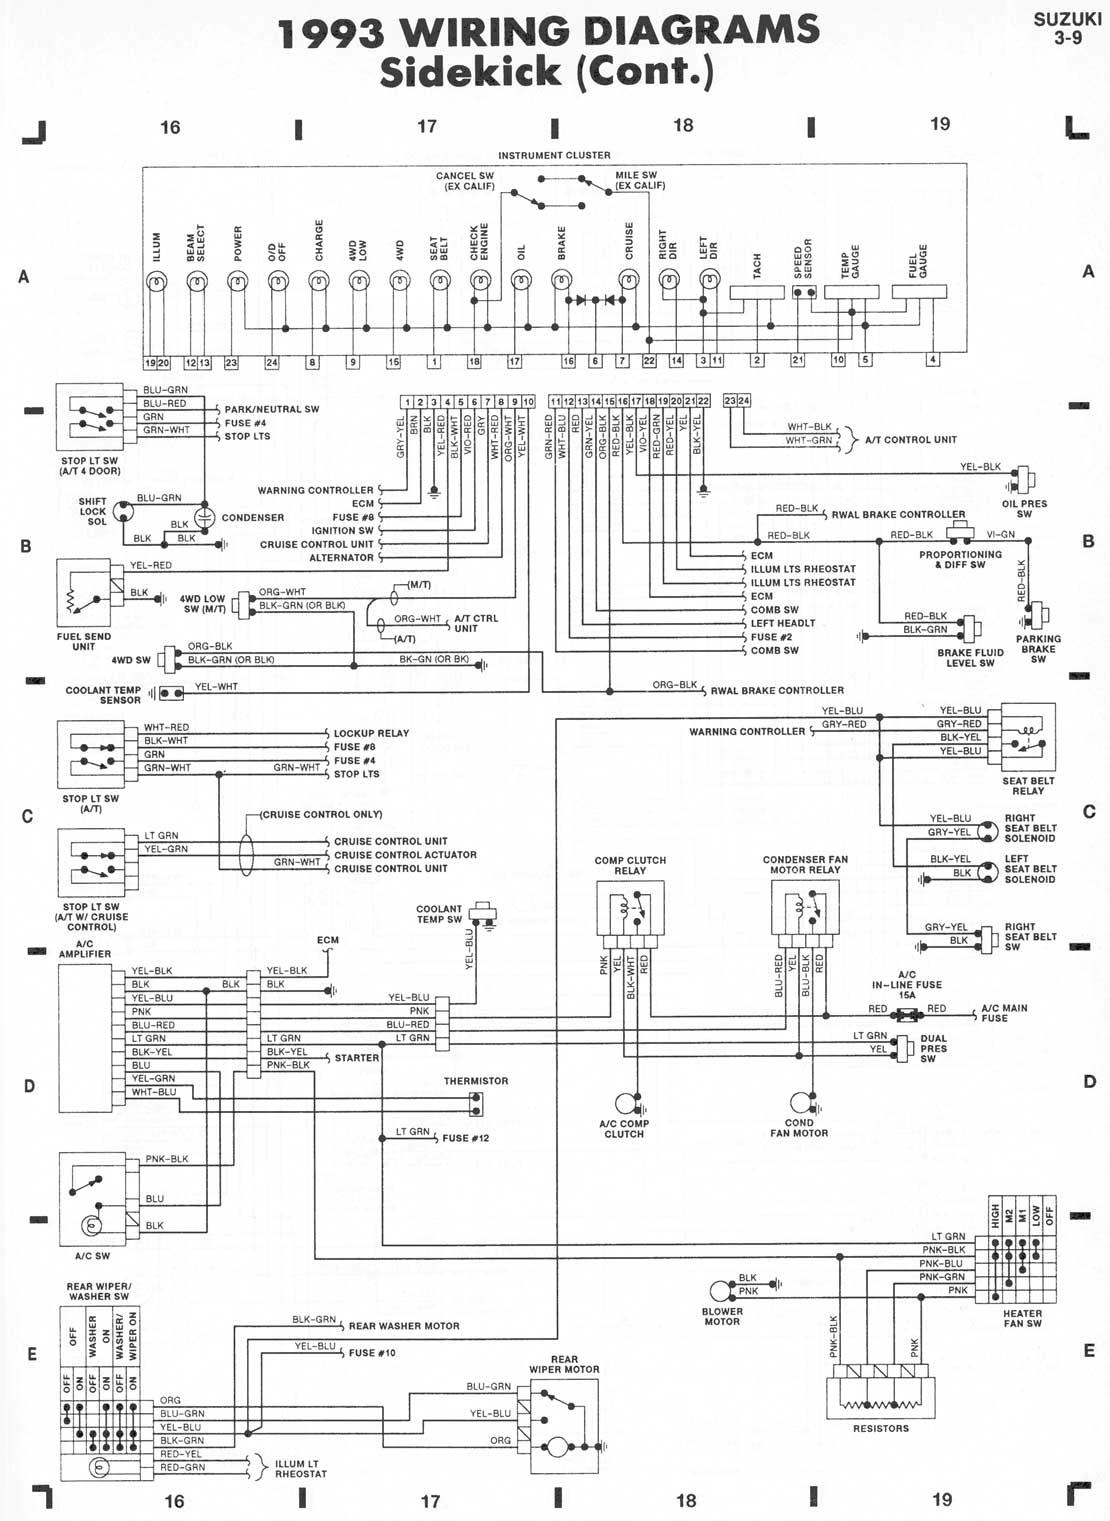 C moreover Maxresdefault besides Sidekick besides Sidekick together with Suzuki. on suzuki samurai wiring diagram